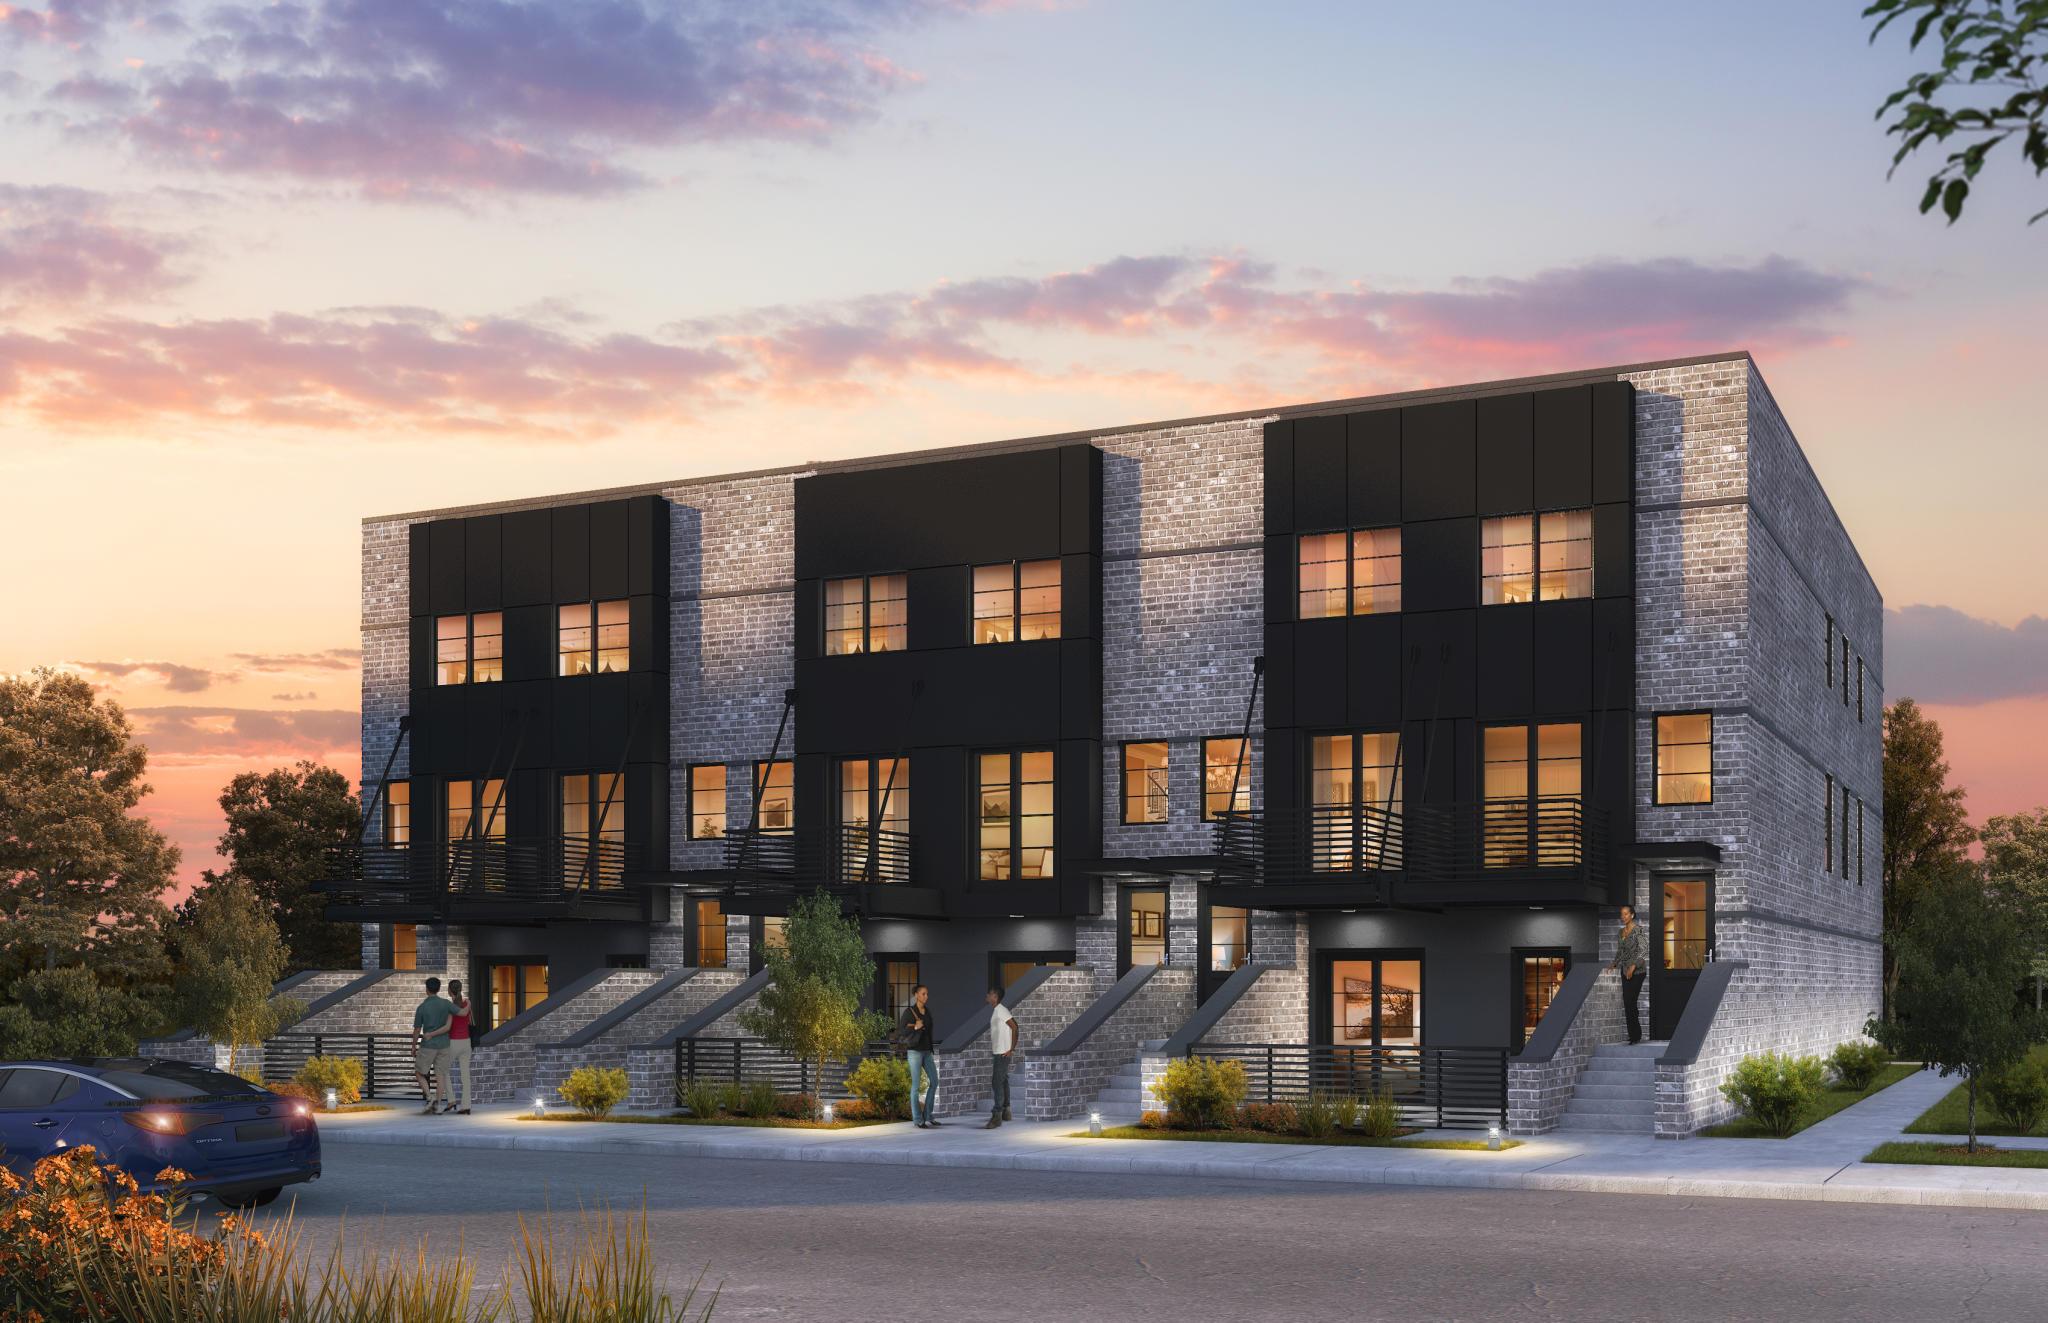 James Place Lofts By Sales New Homes For Sale Detroit Mi 12